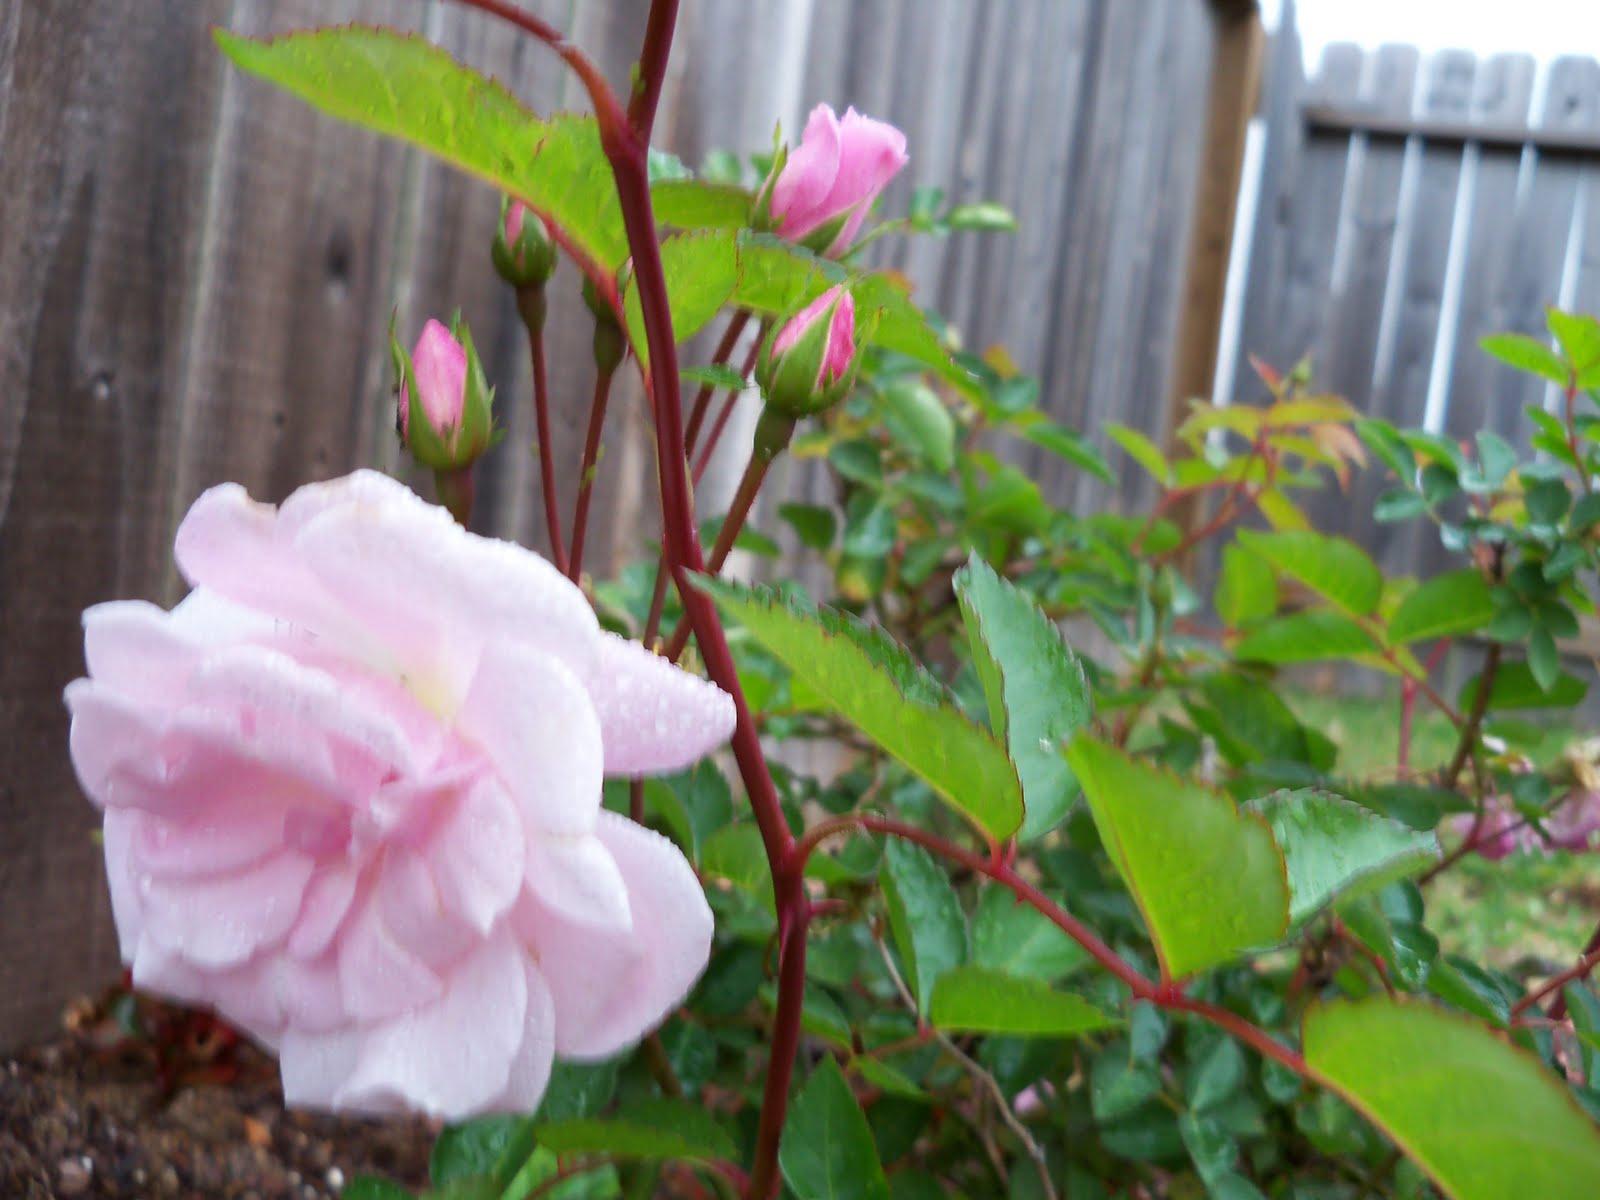 Gardening 2010 - 101_0538.JPG